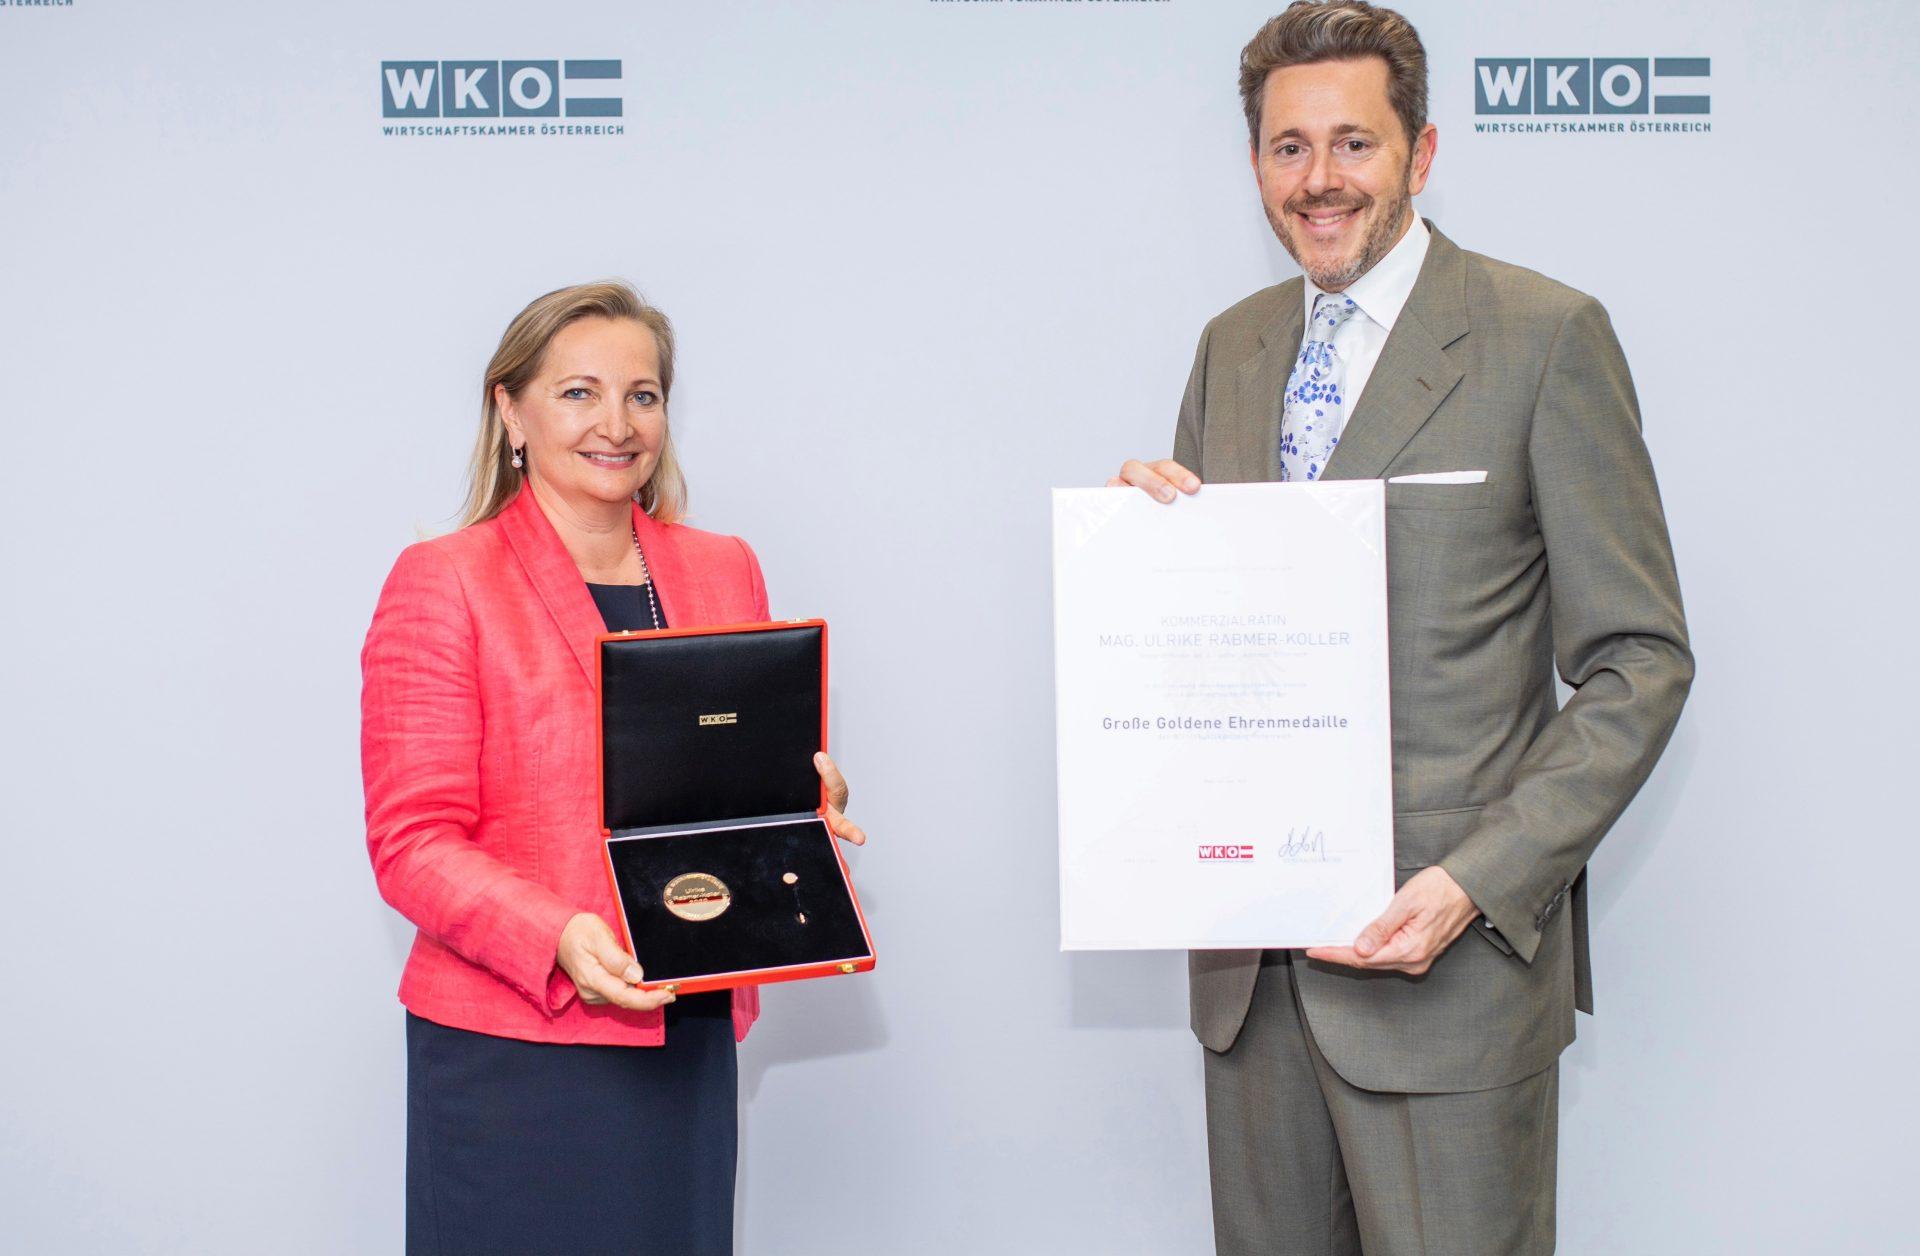 Ulrike Rabmer-Koller is leaving her position as Vice President of the Austrian Chamber of Commerce